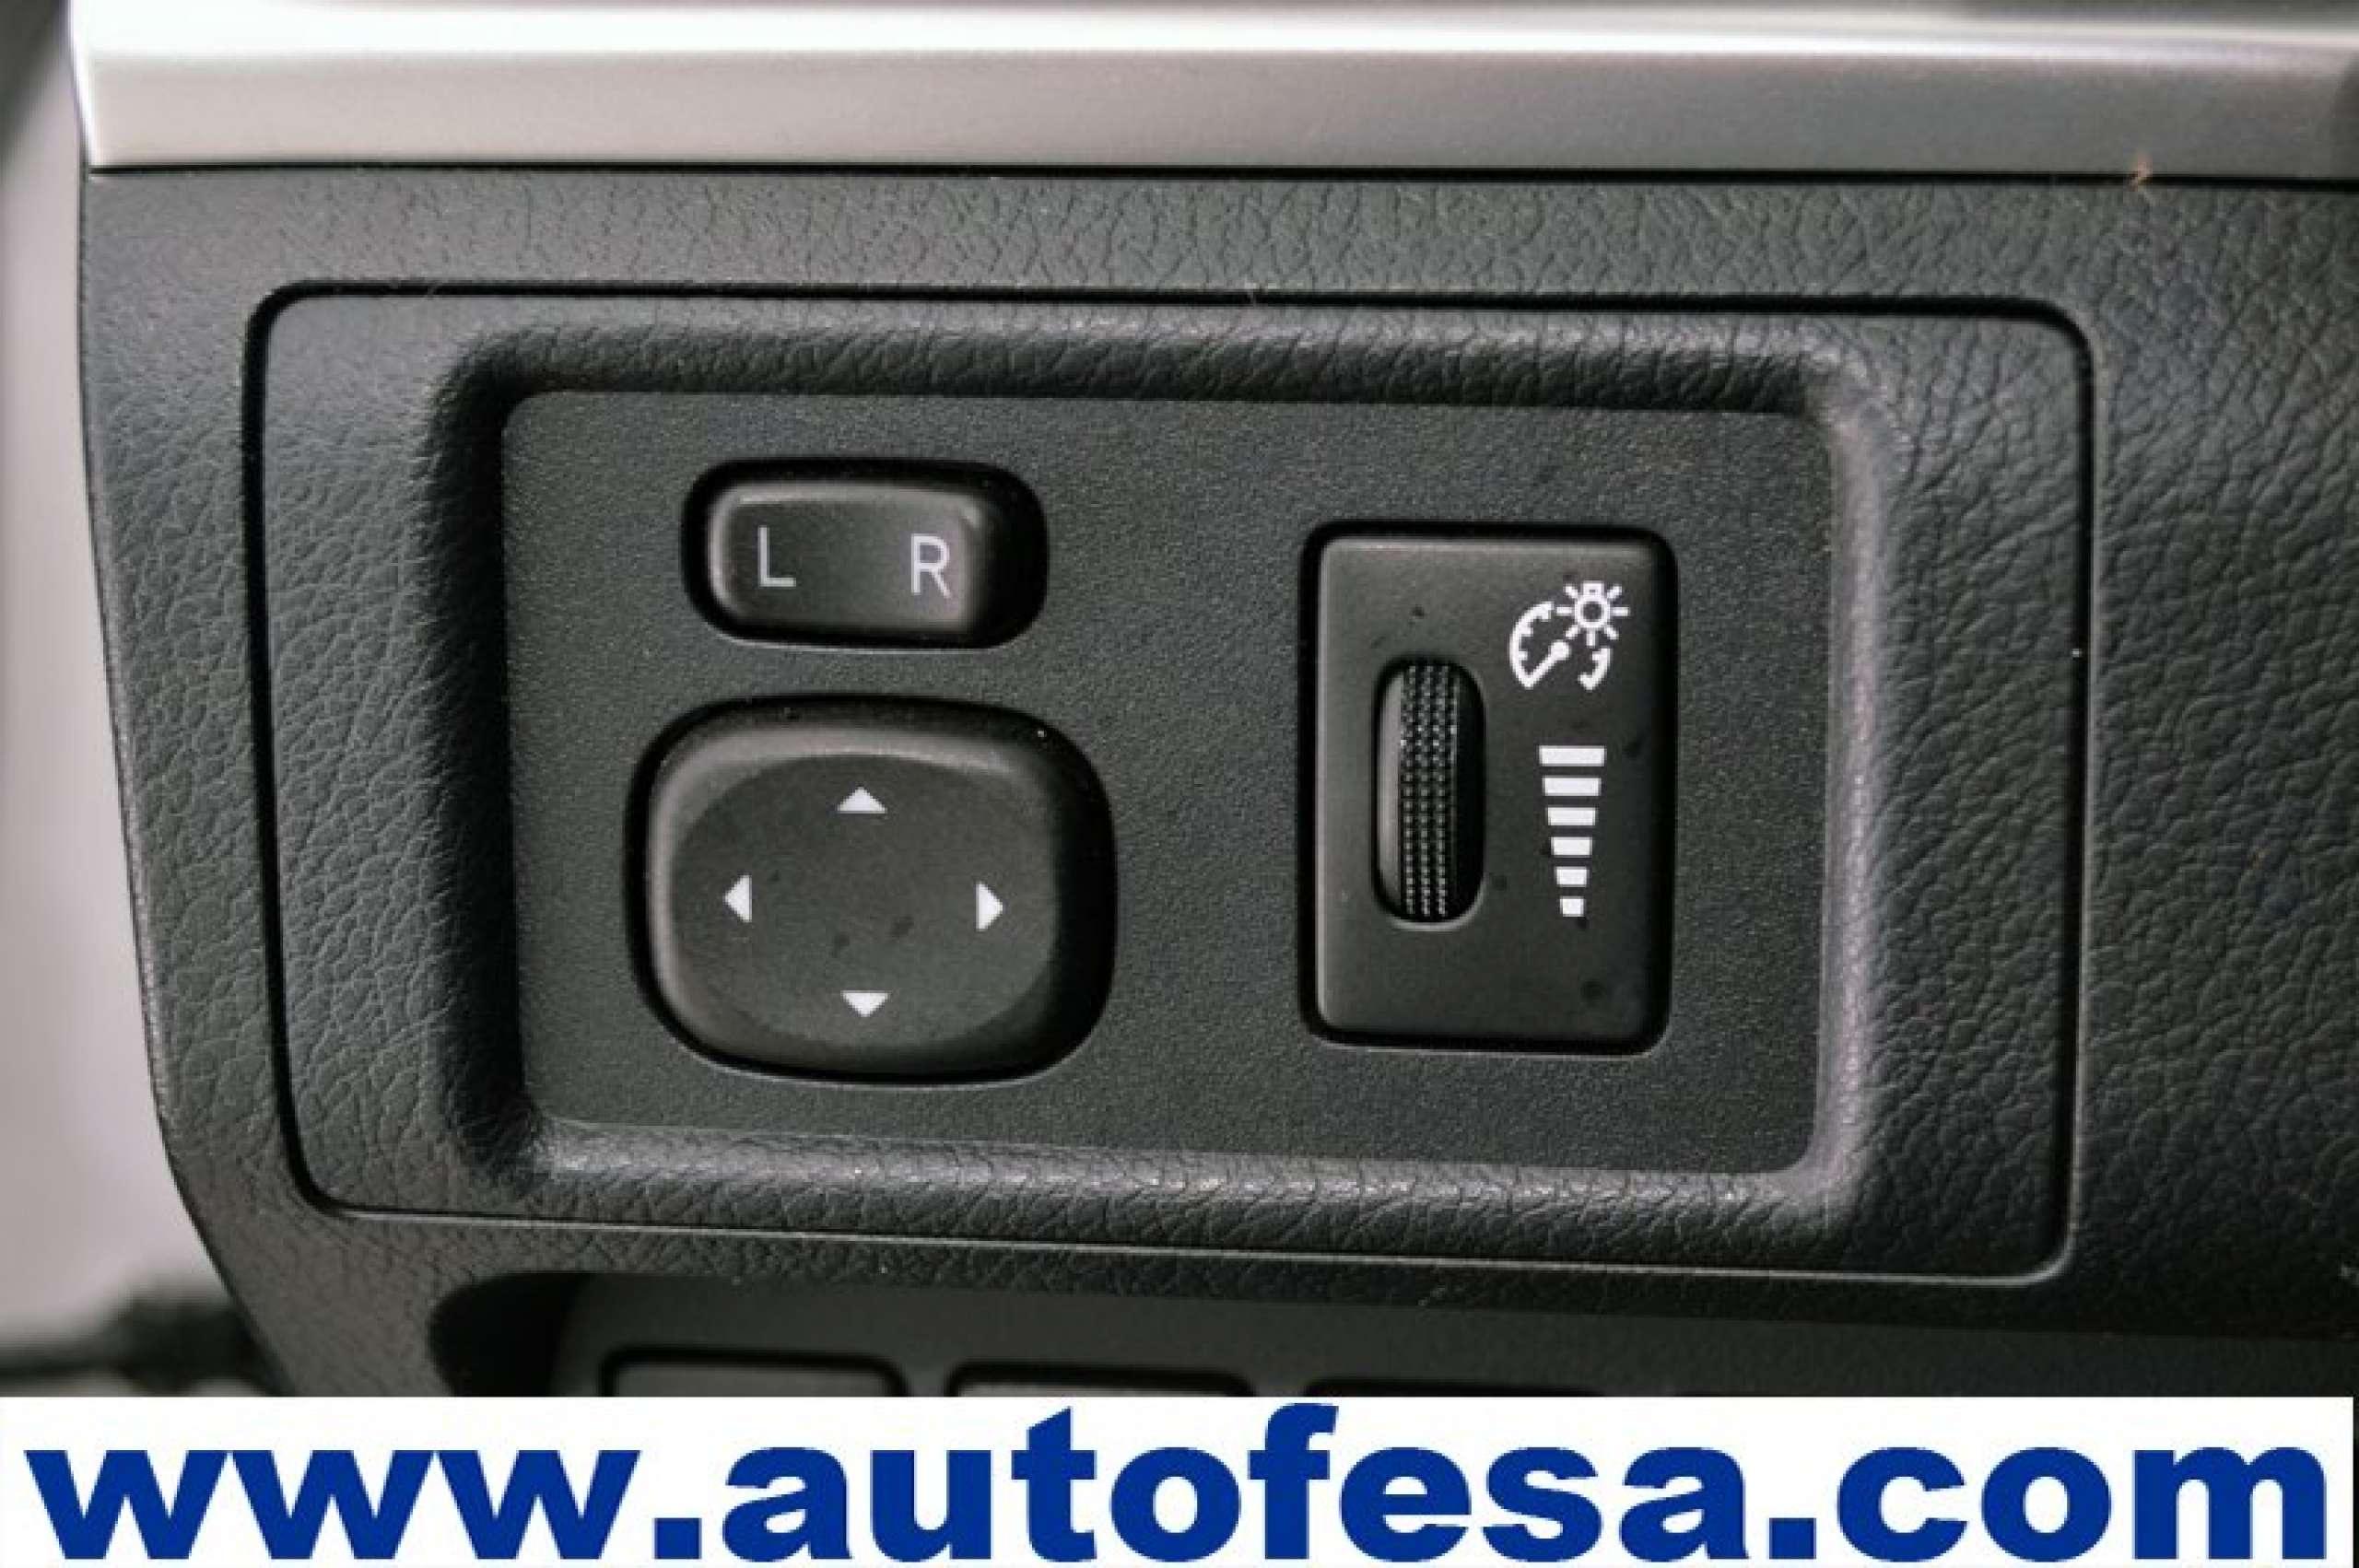 Lexus Ct 200h 1.8 136cv Eco Auto 5p - Foto 23